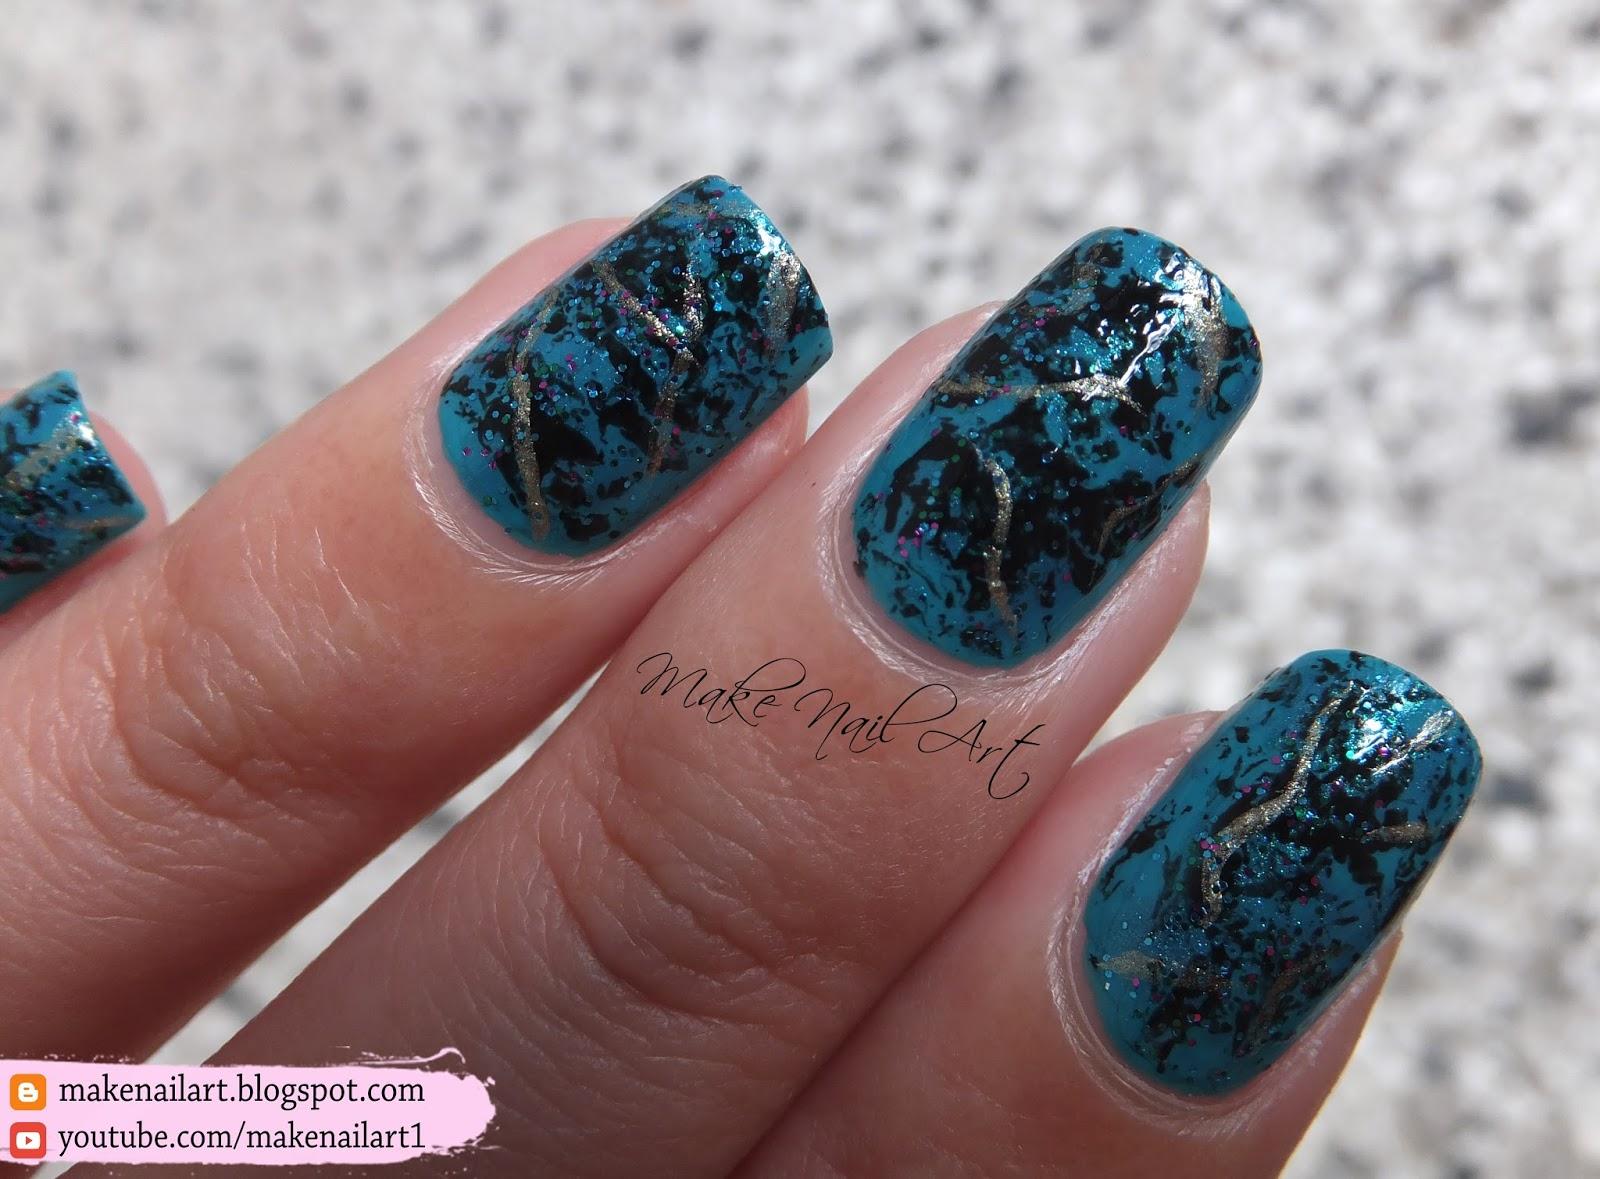 Make Nail Art: Turquoise Stone Nail Art Design Tutorial